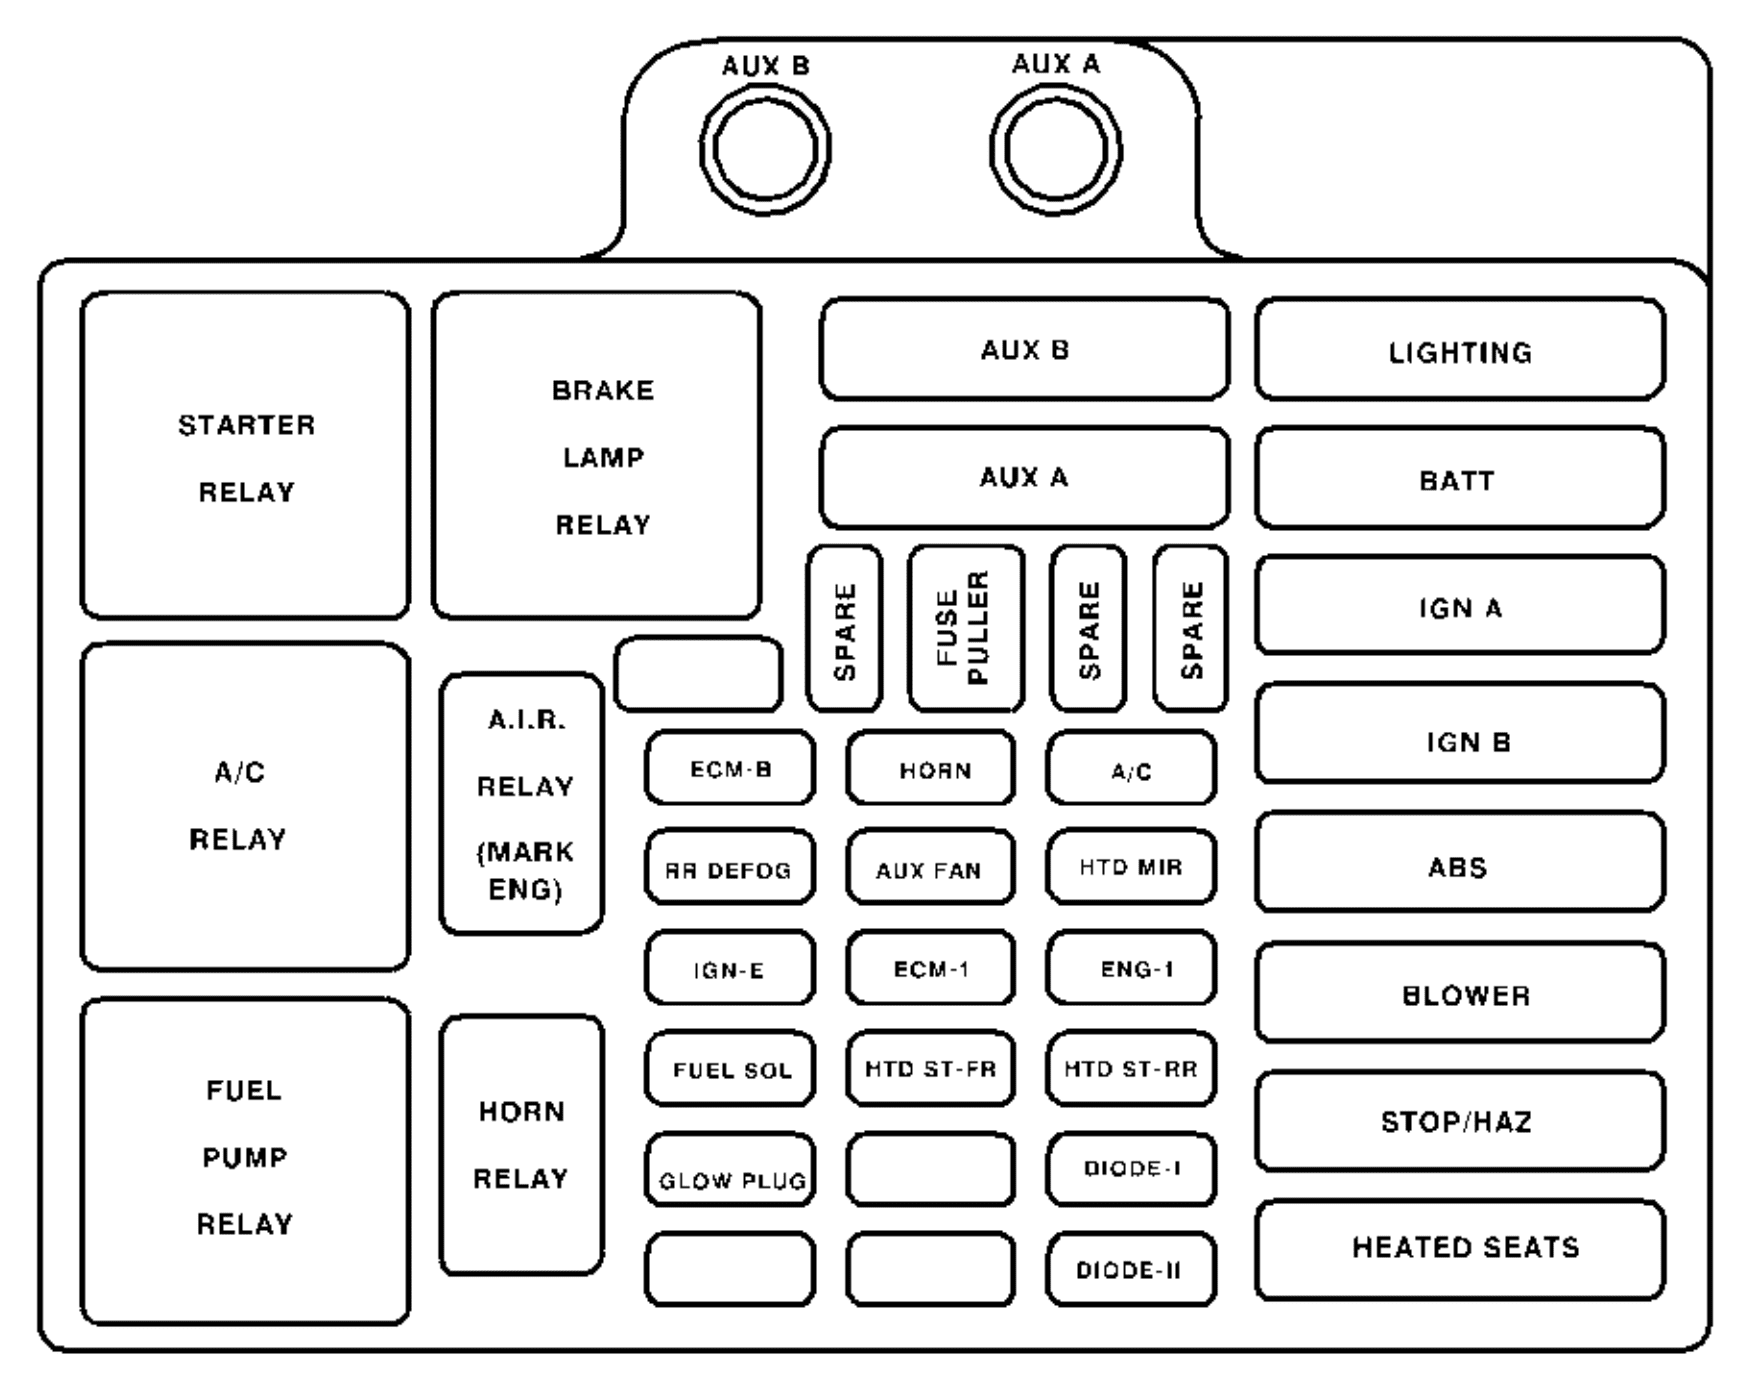 Chevrolet Suburban - fuse box - underhood fuse/relay center